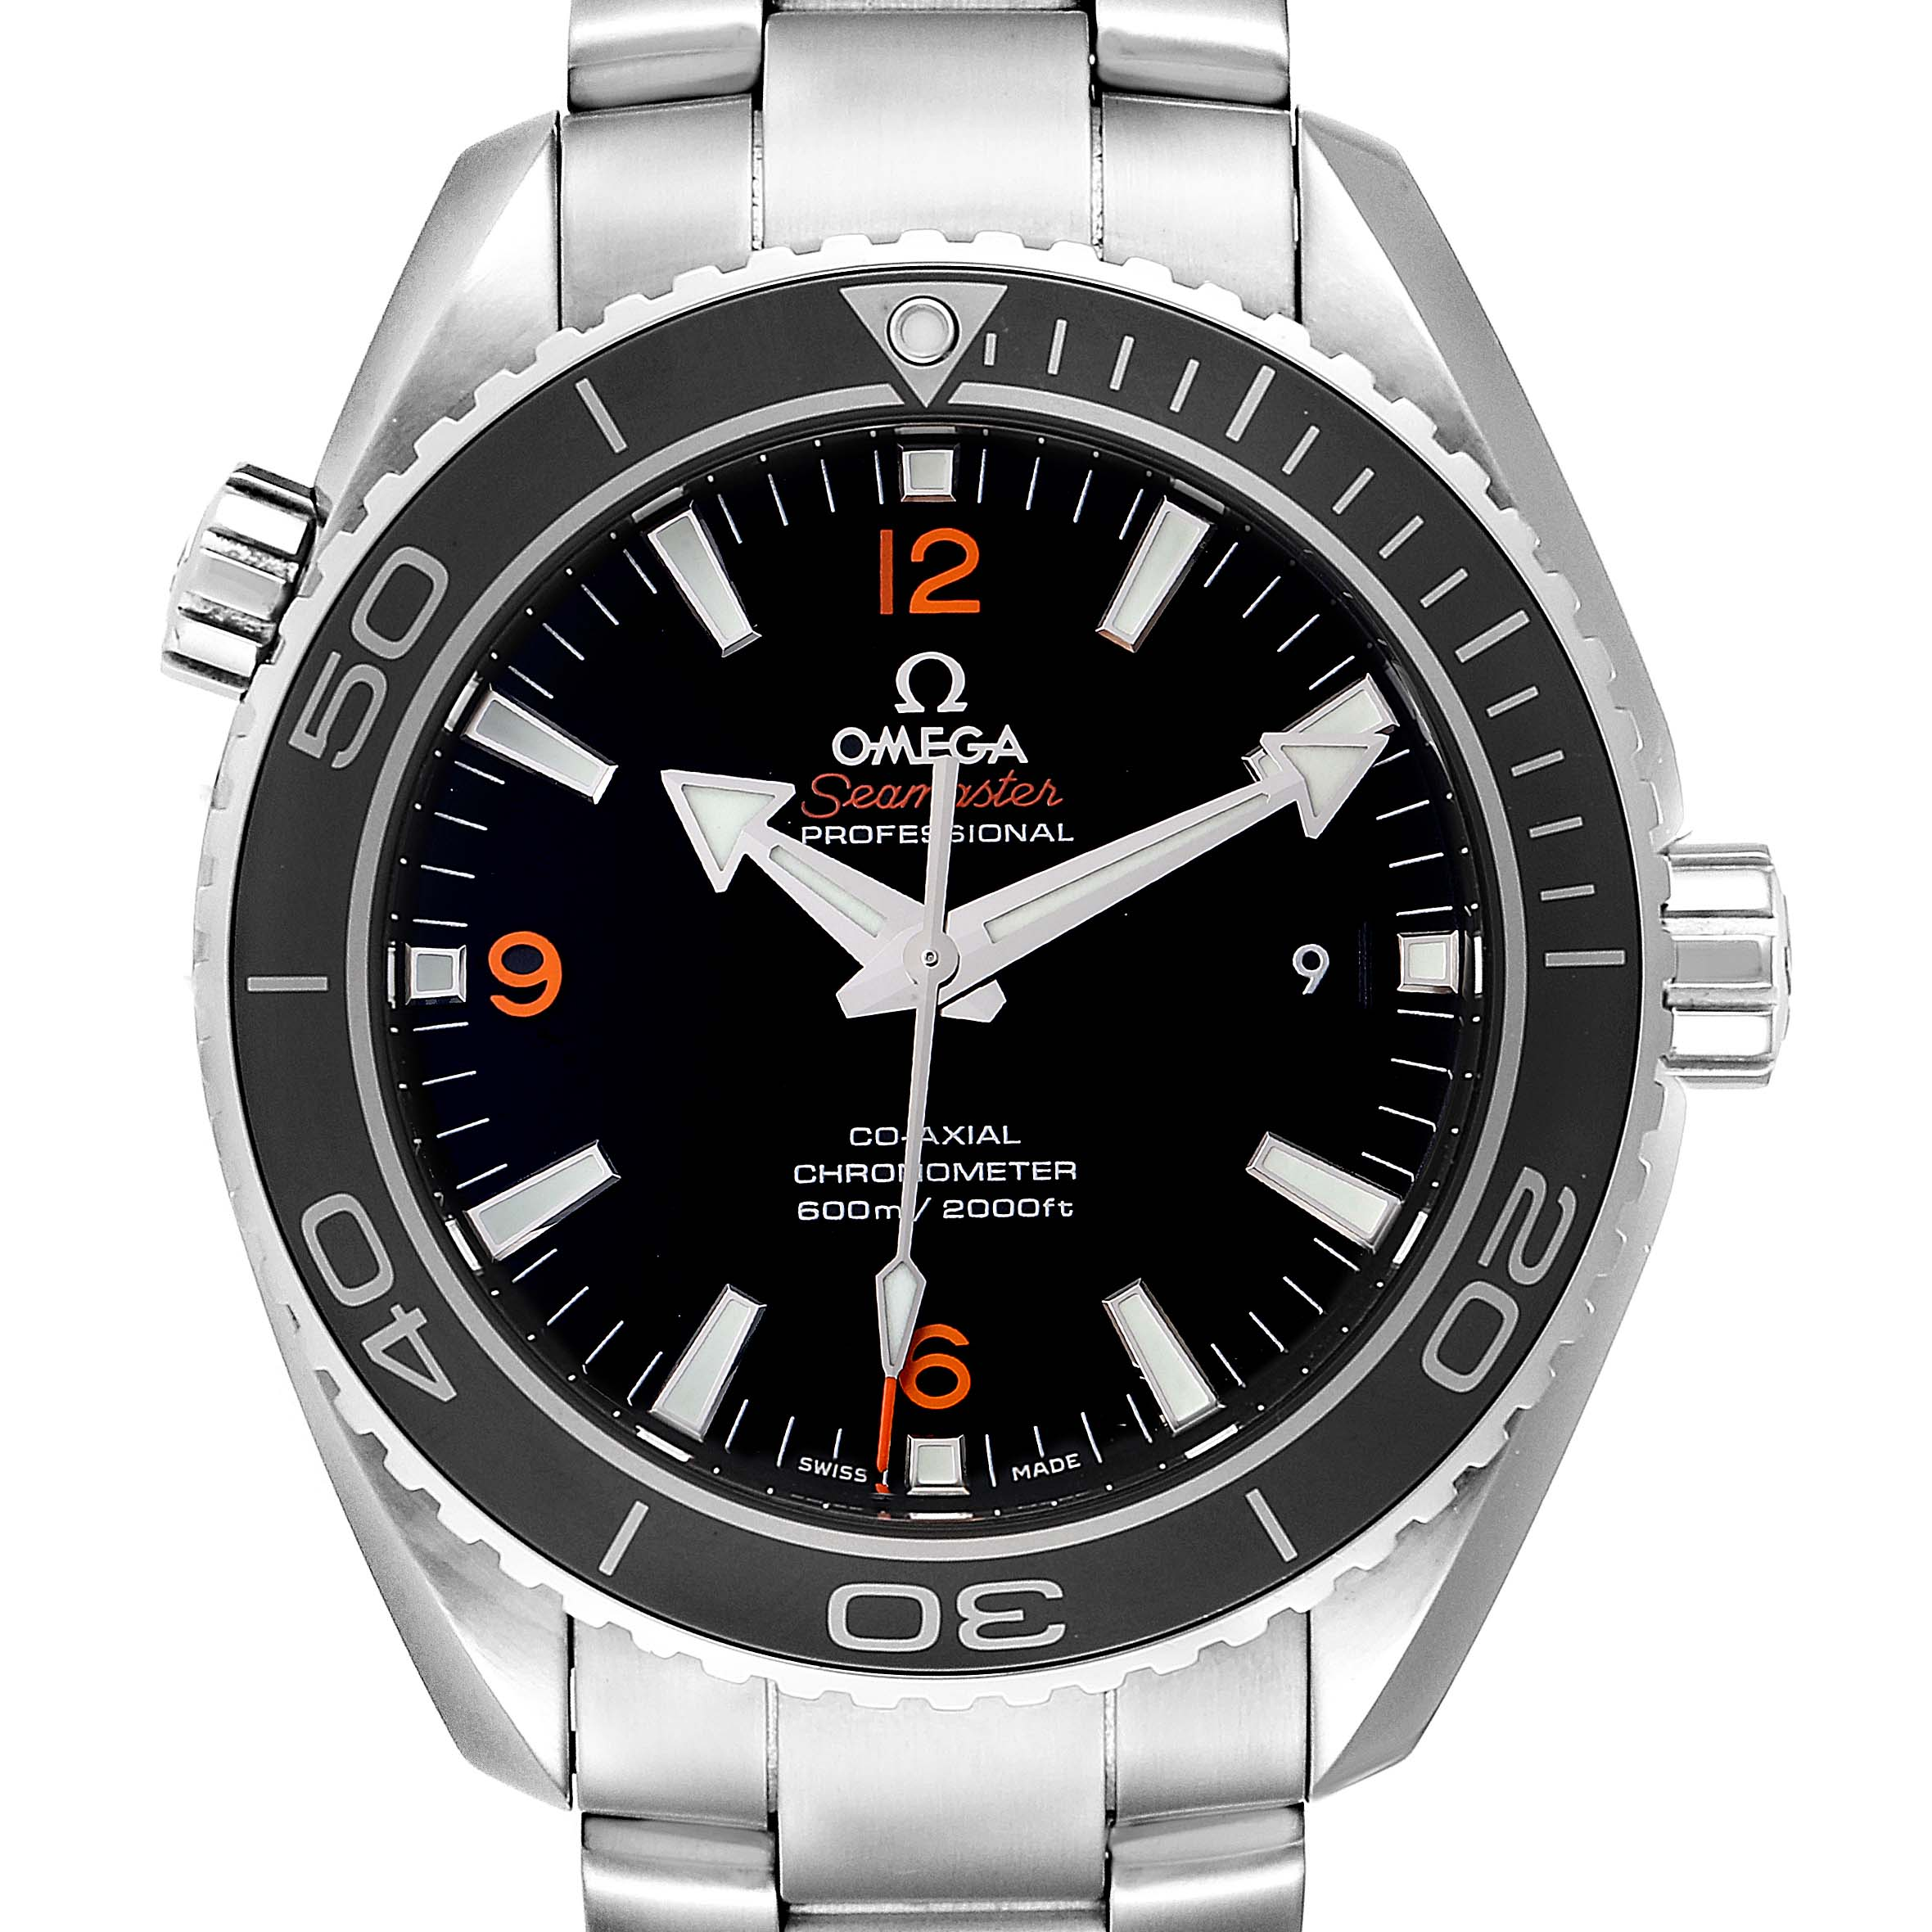 Omega Seamaster Planet Ocean 600M Watch 232.30.46.21.01.003 Box Card